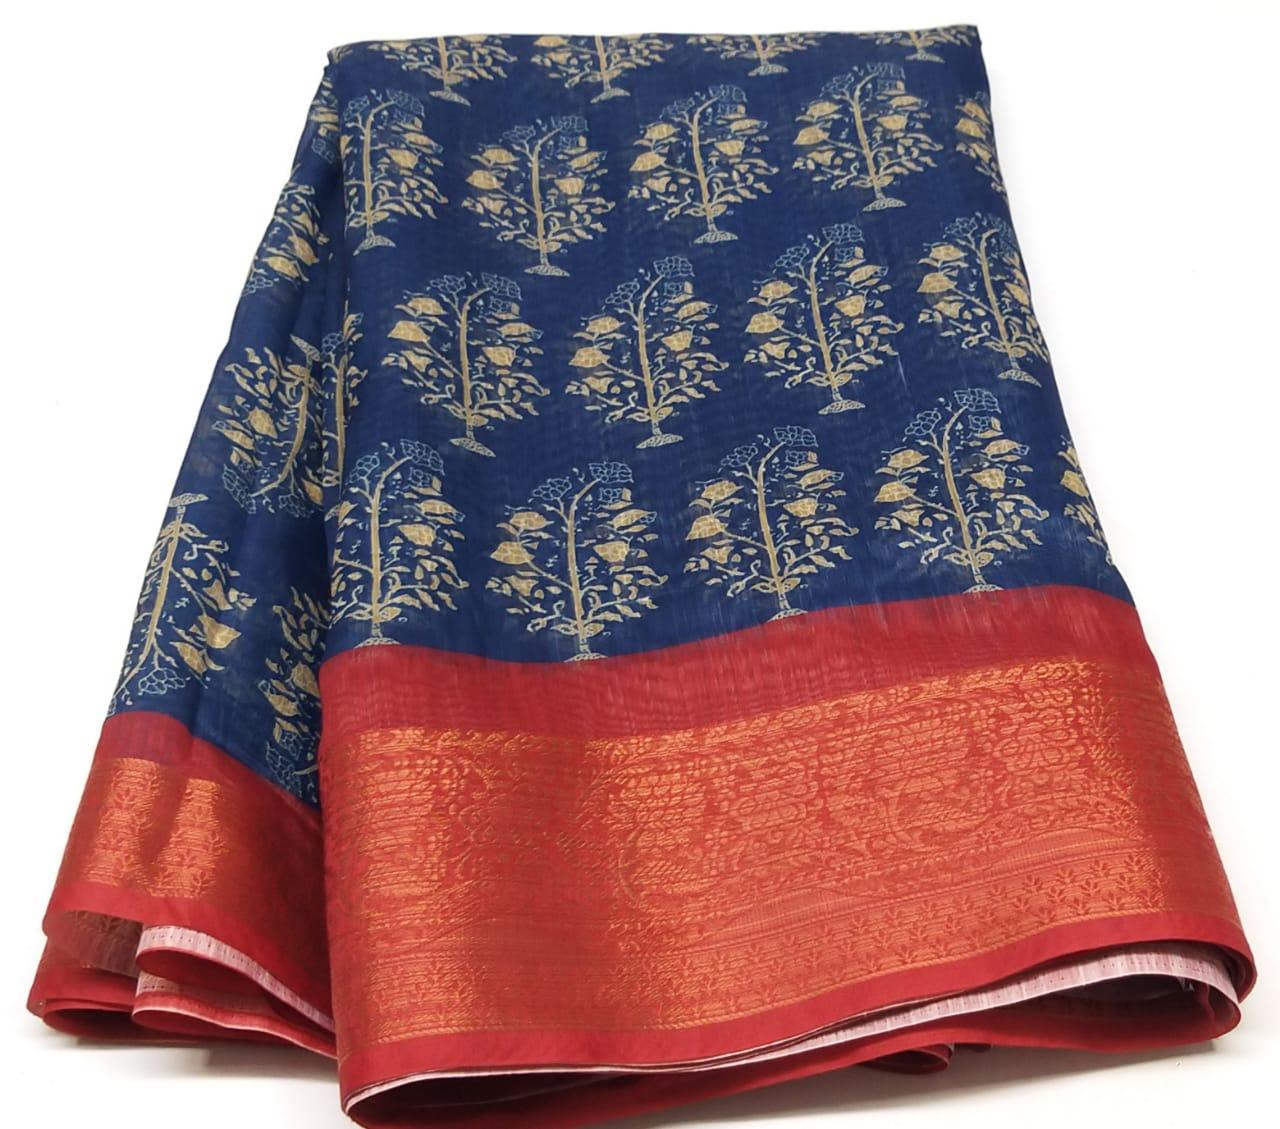 Rambha-1 Dark Blue Cotton Saree